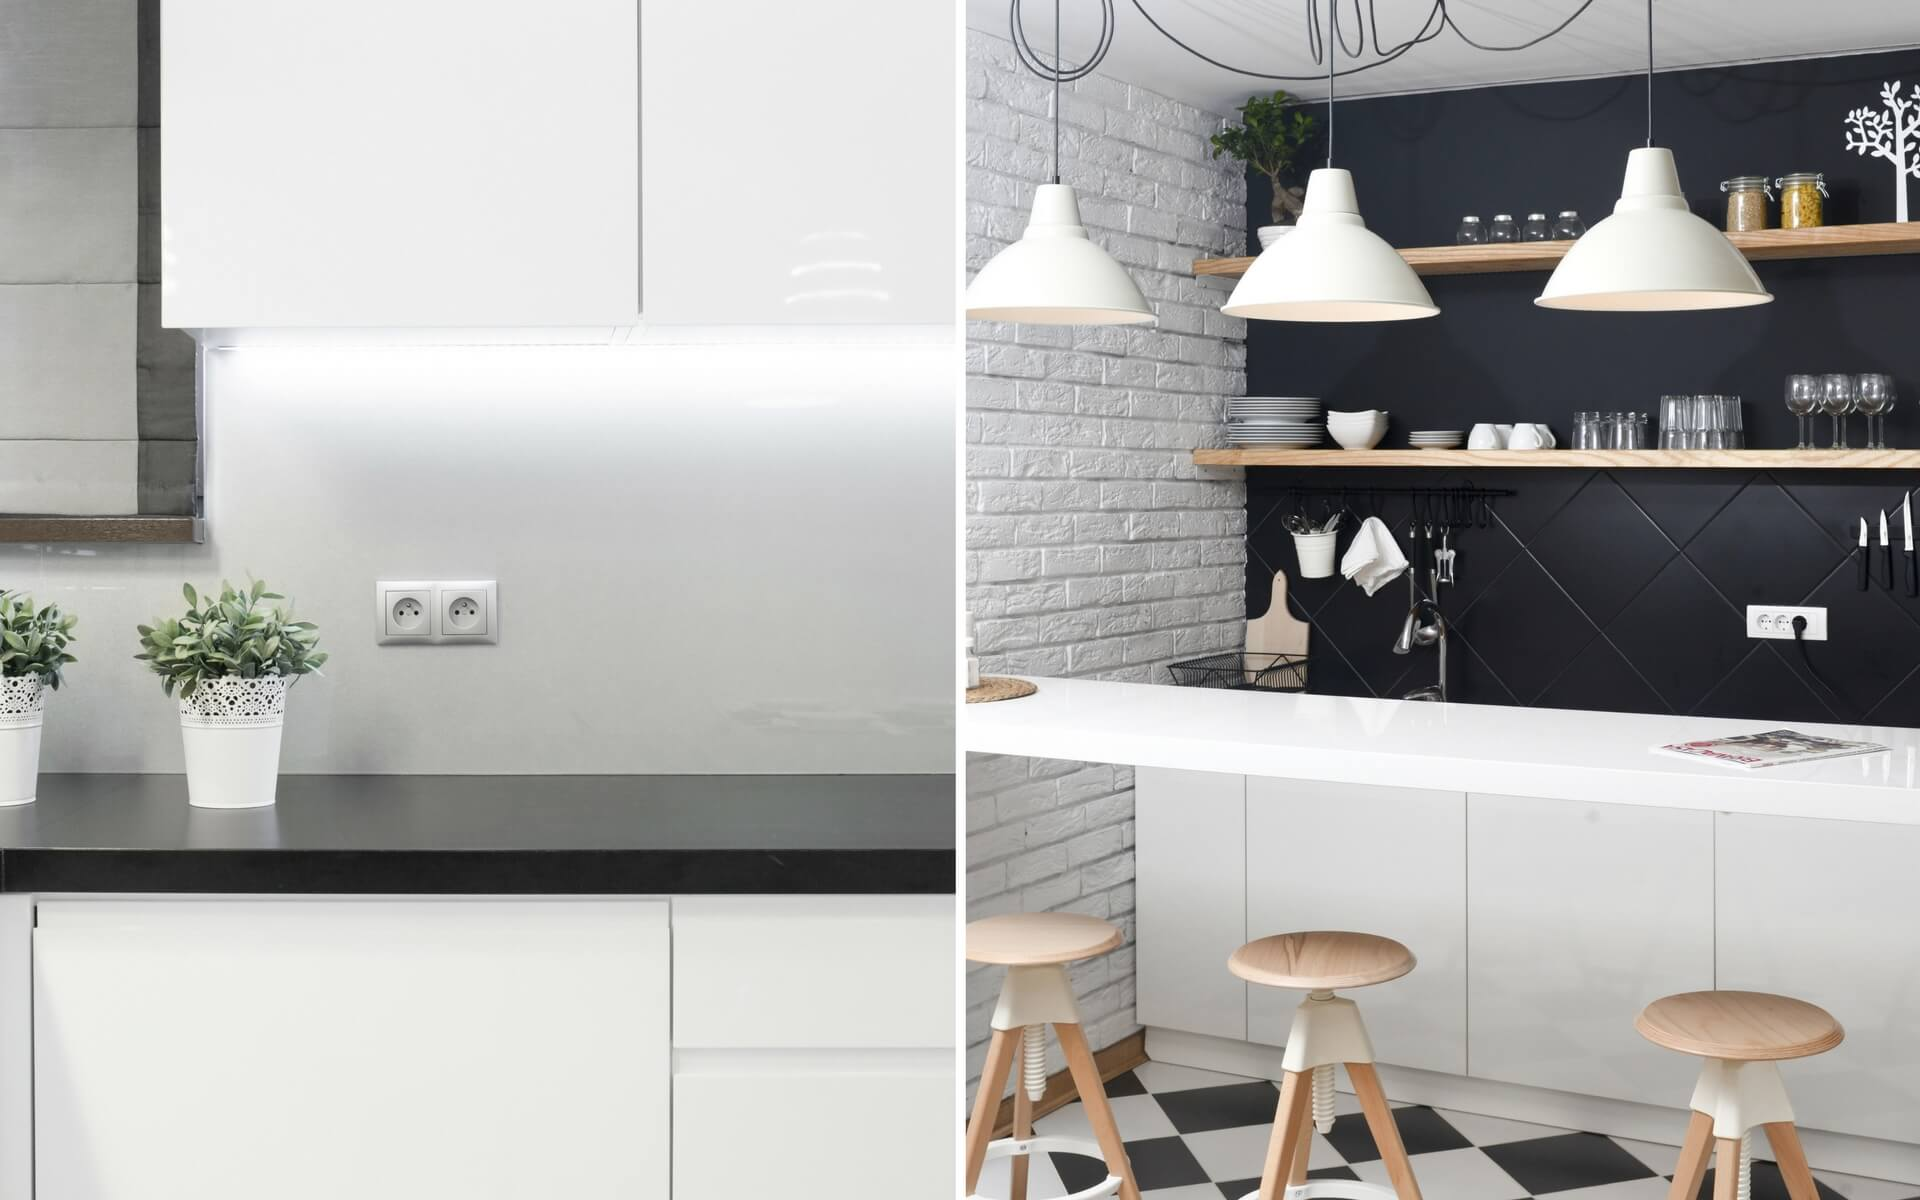 Arredare una piccola cucina consigli pratici blog oknoplast - Arredare cucina piccola rettangolare ...